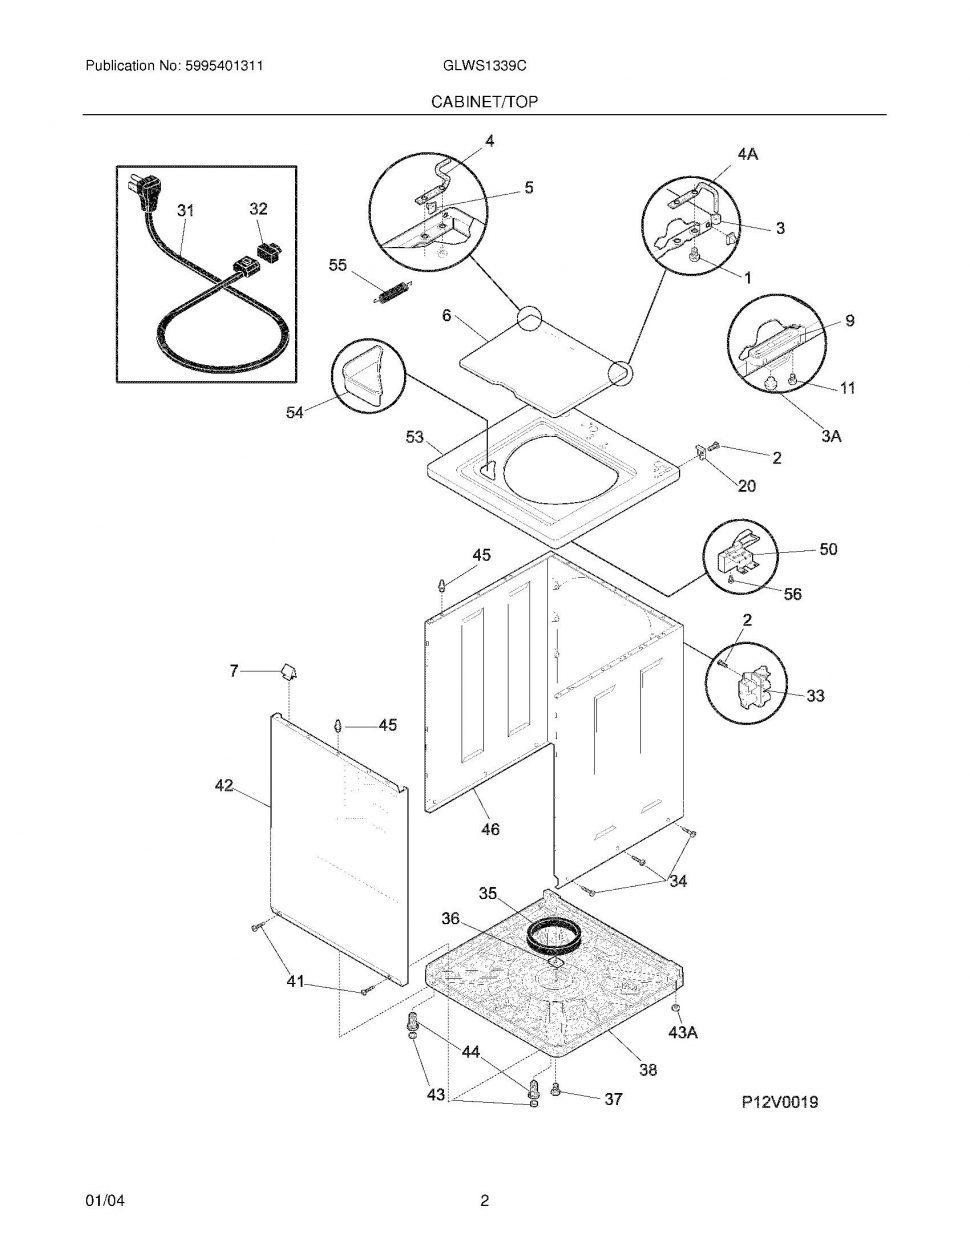 fender deluxe lone star stratocaster wiring diagram